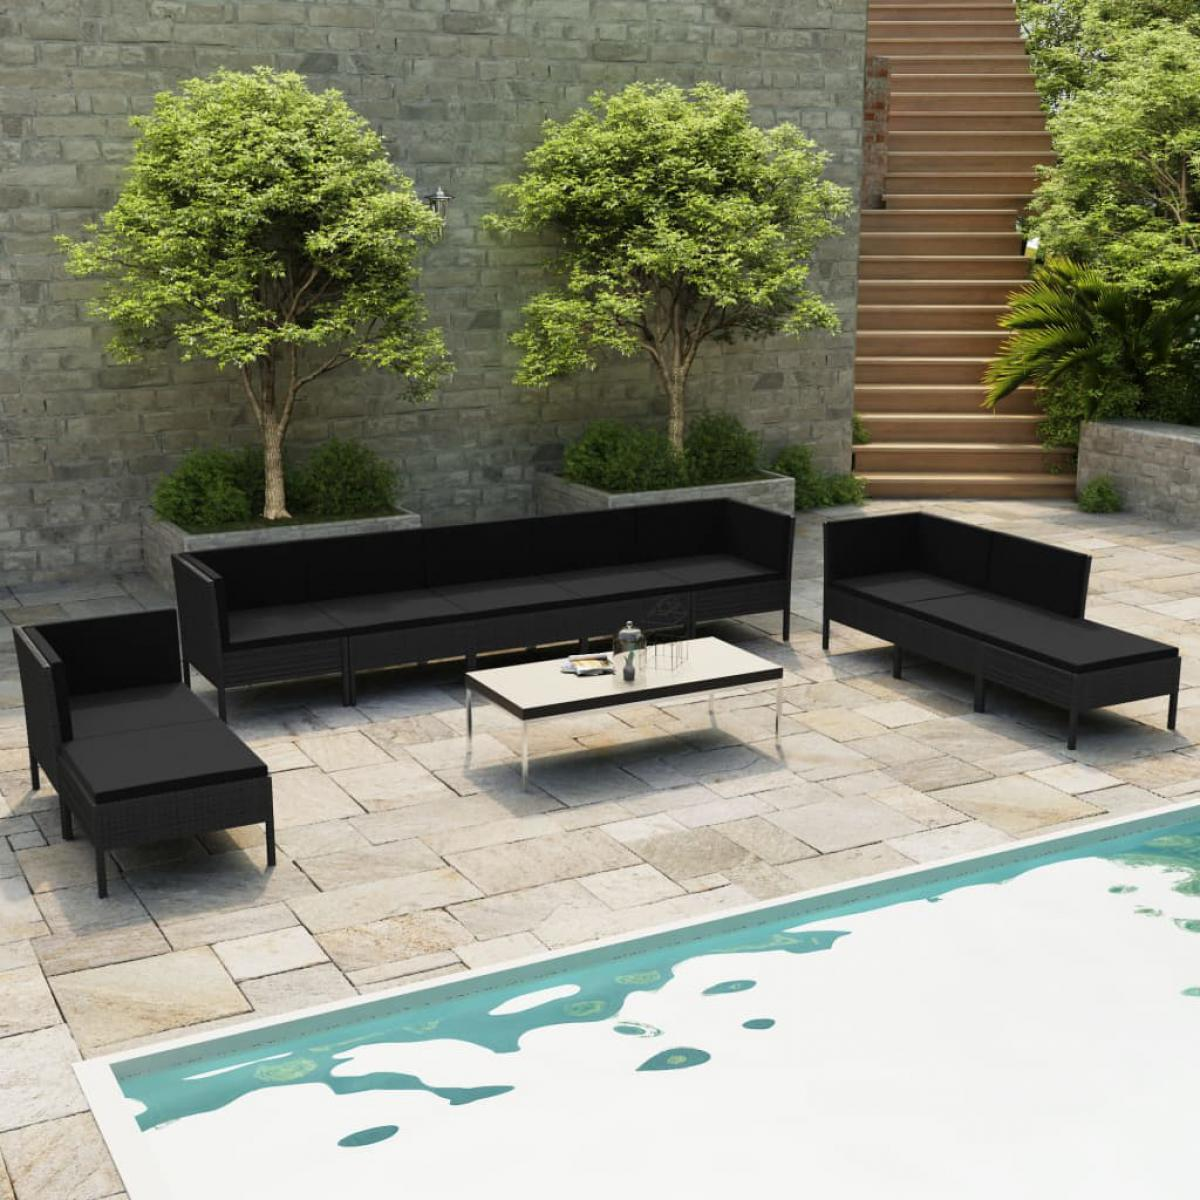 Vidaxl vidaXL Salon de jardin 10 pcs avec coussins Résine tressée Noir